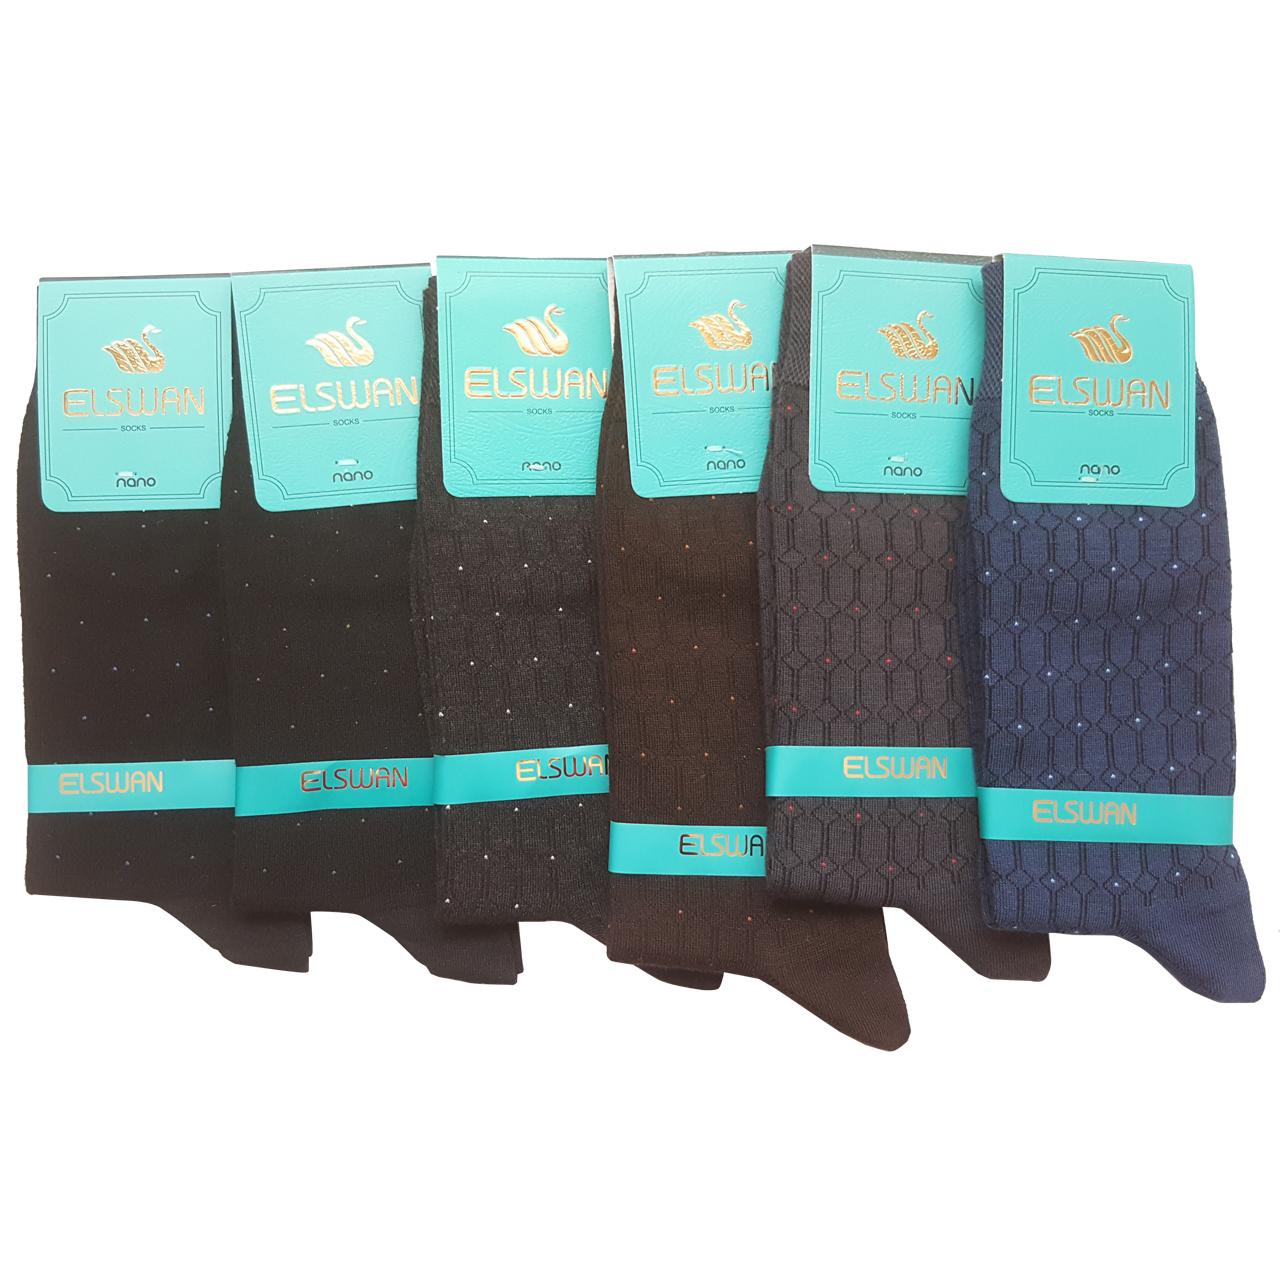 جوراب مردانه ال سون طرح مسکو کد PH22 مجموعه 6 عددی